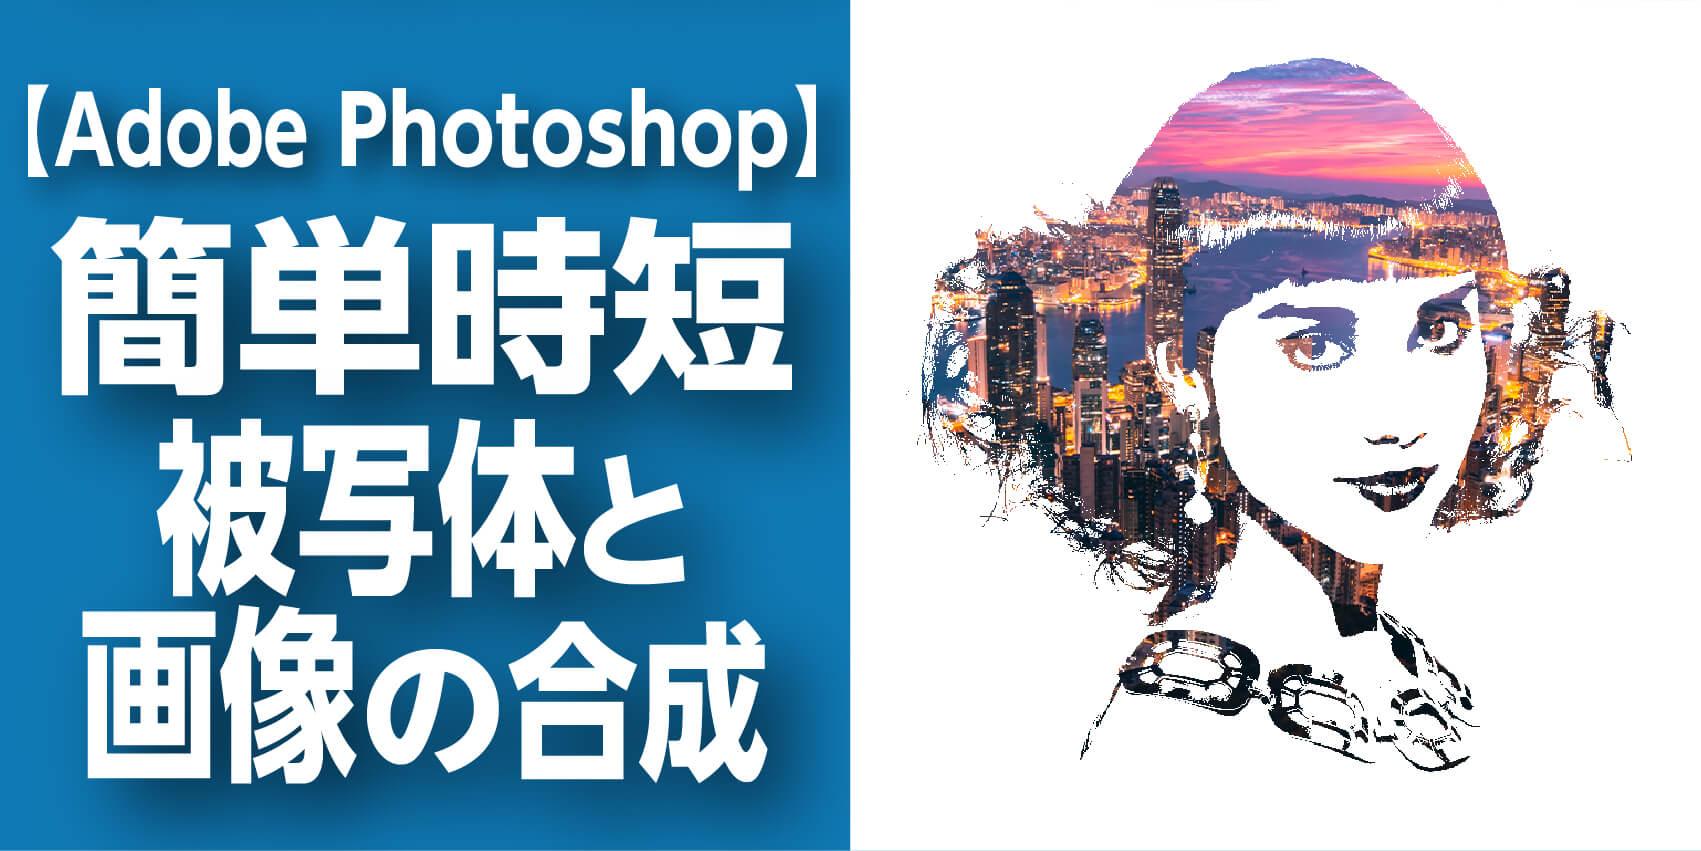 【Photoshop】1分でできる画像加工/被写体を別画像と複合